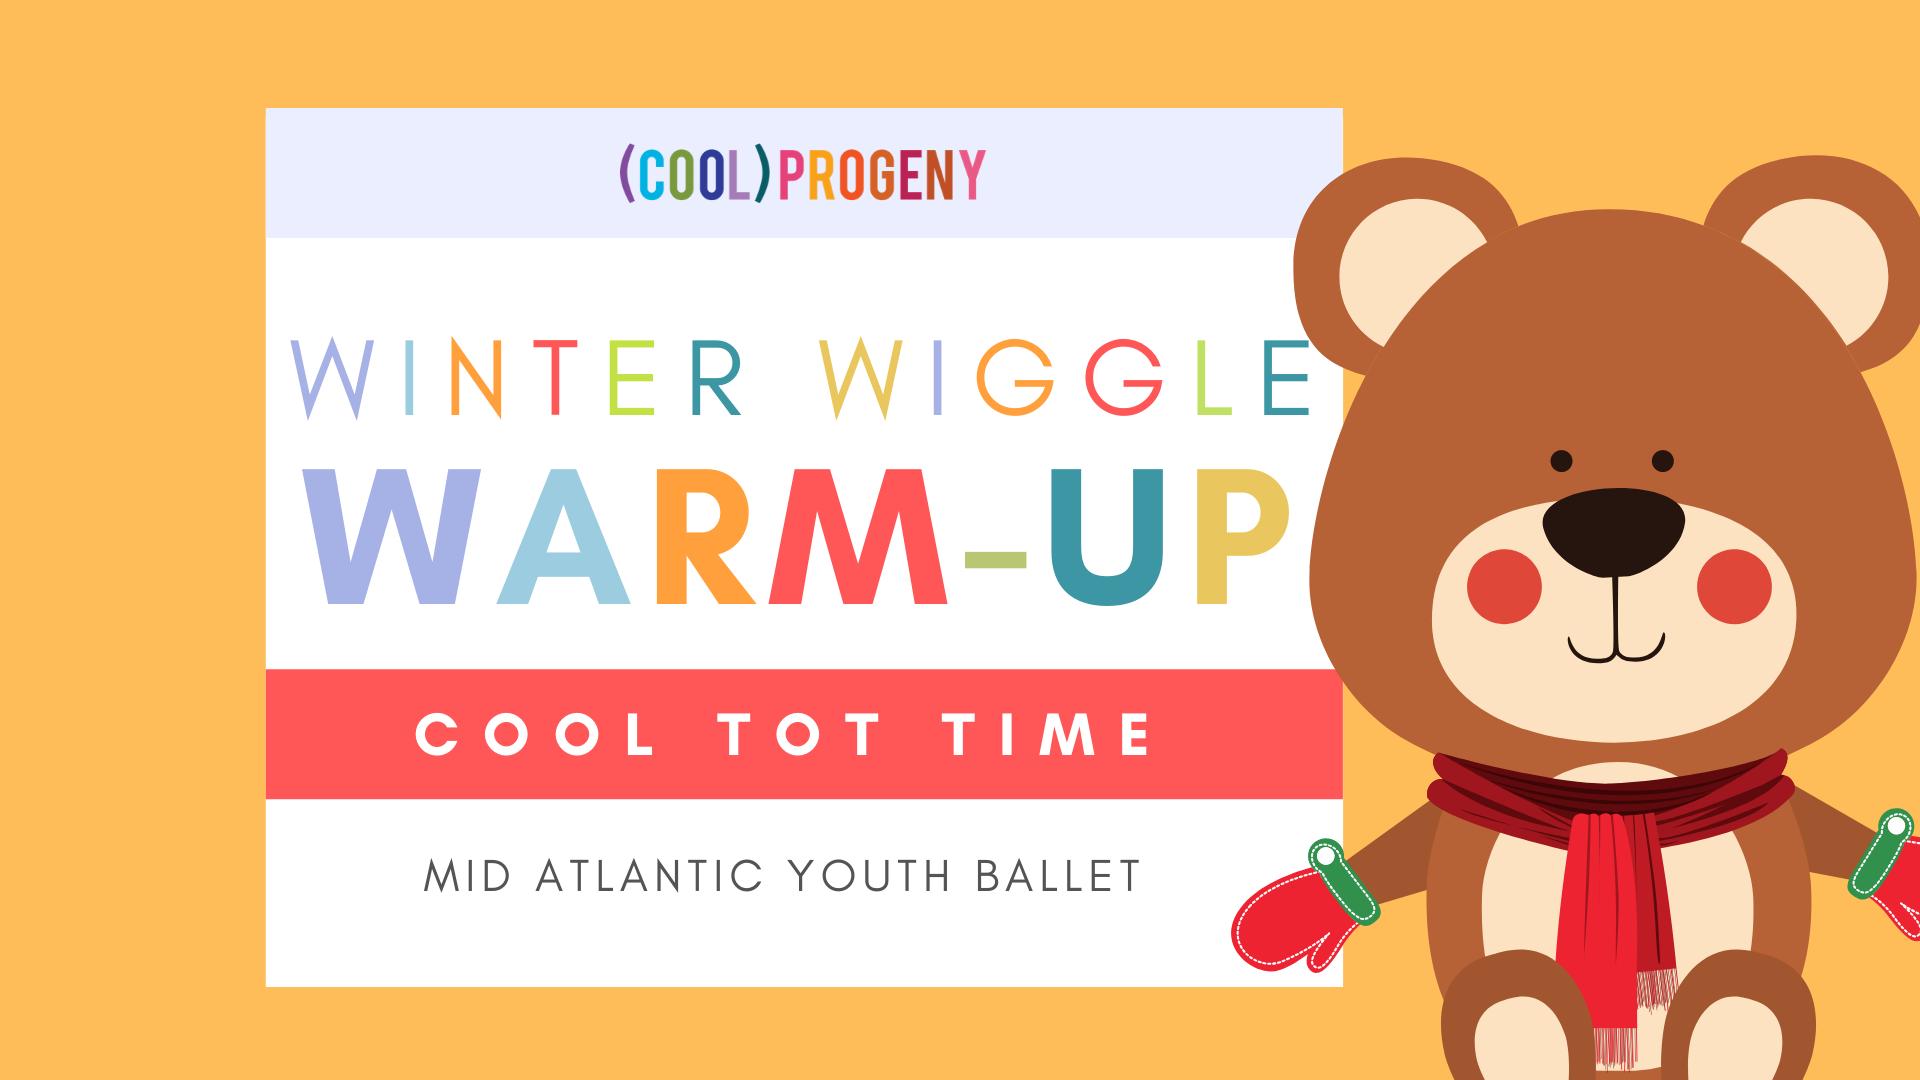 Winter Wiggle Warm-Up